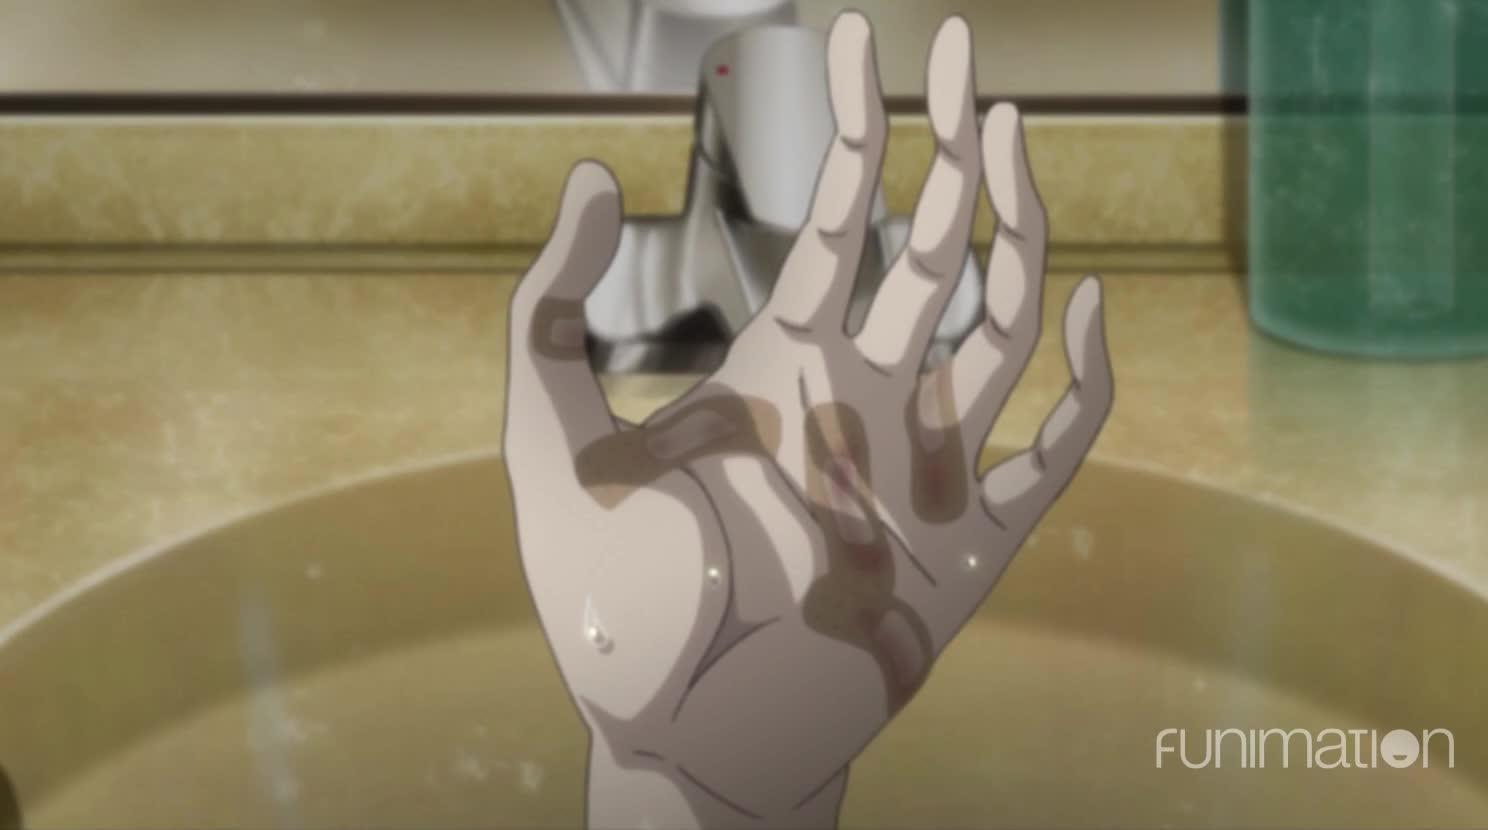 anime, funimation, sci-fi, scifi, steins gate, steins gate 0, steins;gate, steins;gate episode 11, steinsgate, steinsgate 0, getting dizzy GIFs